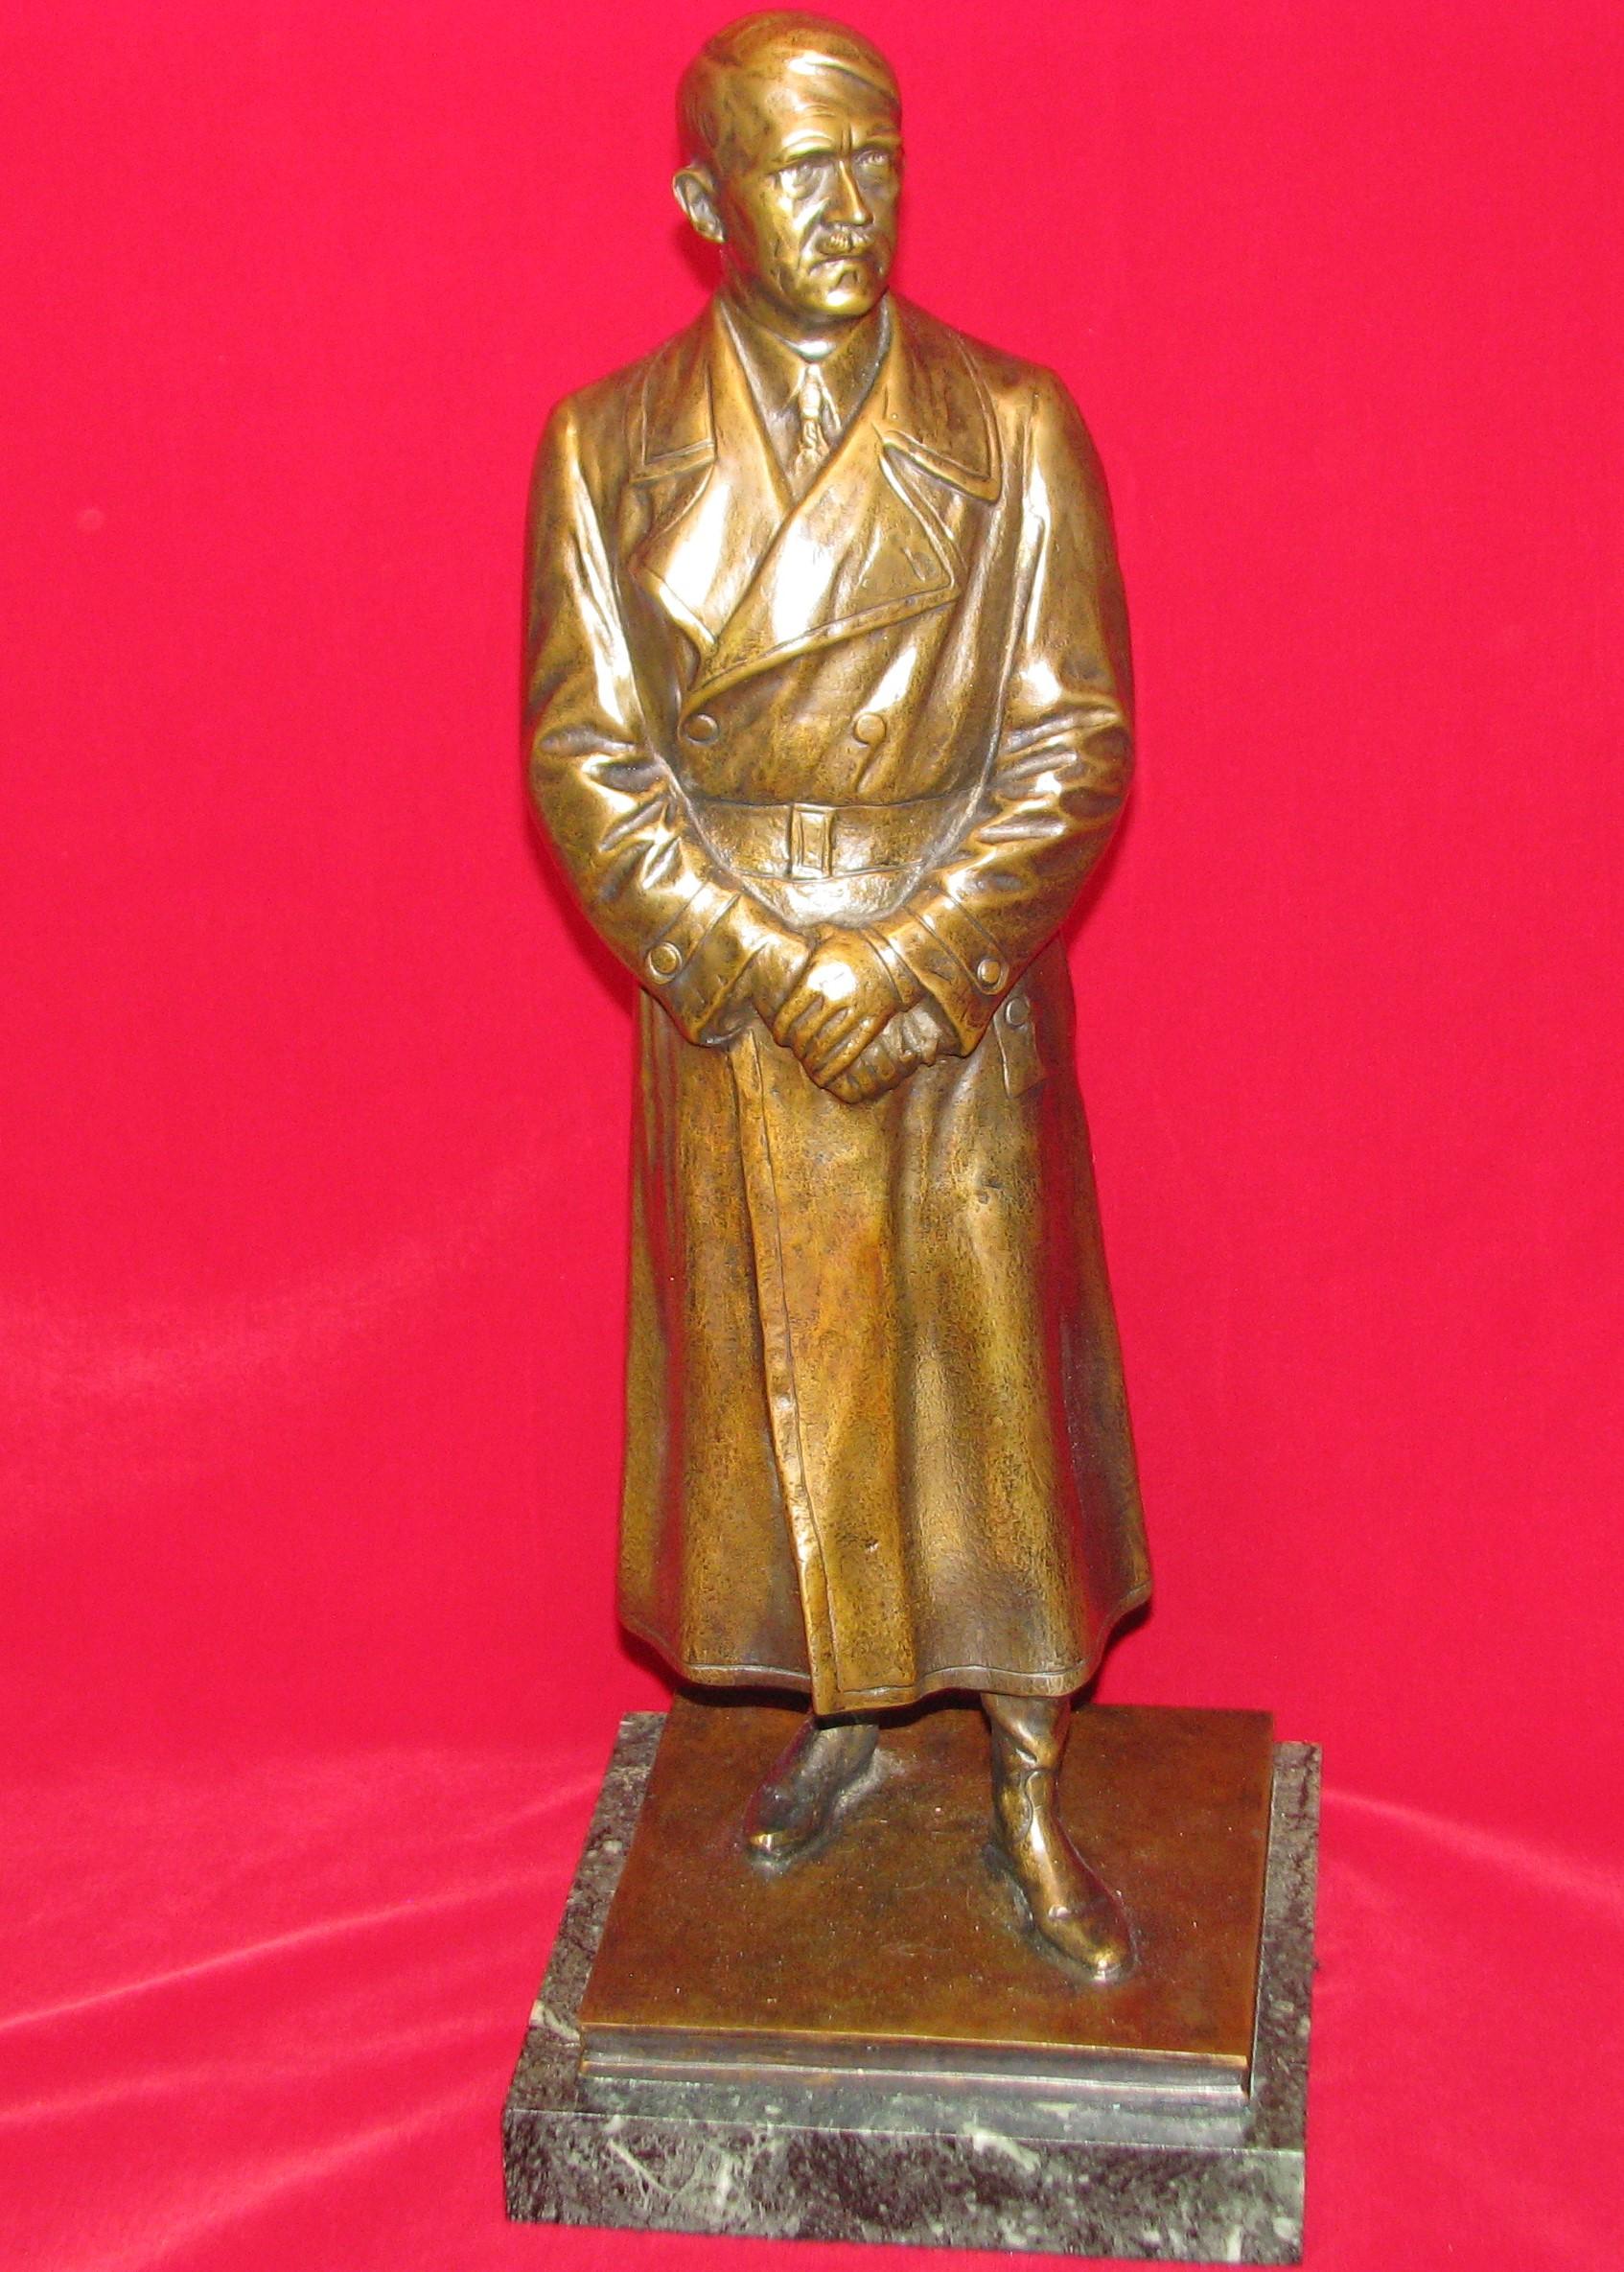 Original WWII German Large Bronze Statue Adolf Hitler Signed Kurt Schmid Ehmenn 17-115